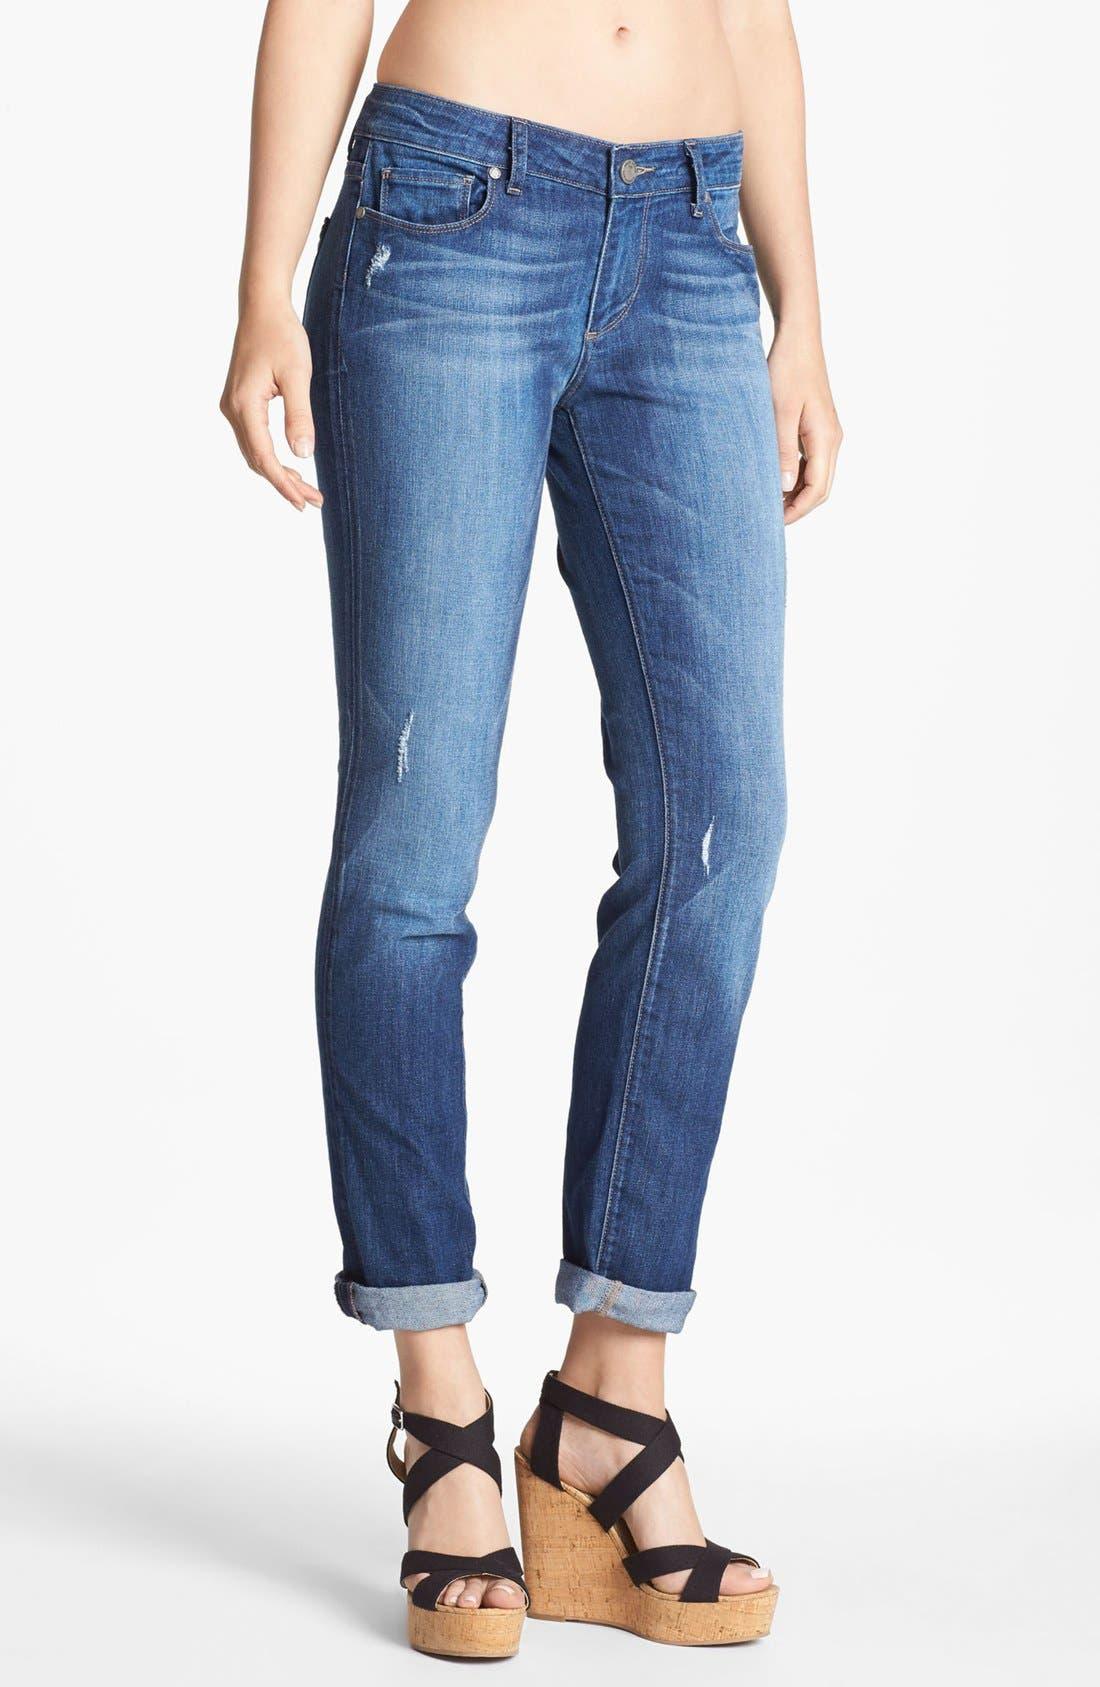 Alternate Image 1 Selected - Paige Denim 'Jimmy Jimmy' Skinny Jeans (Penelope)